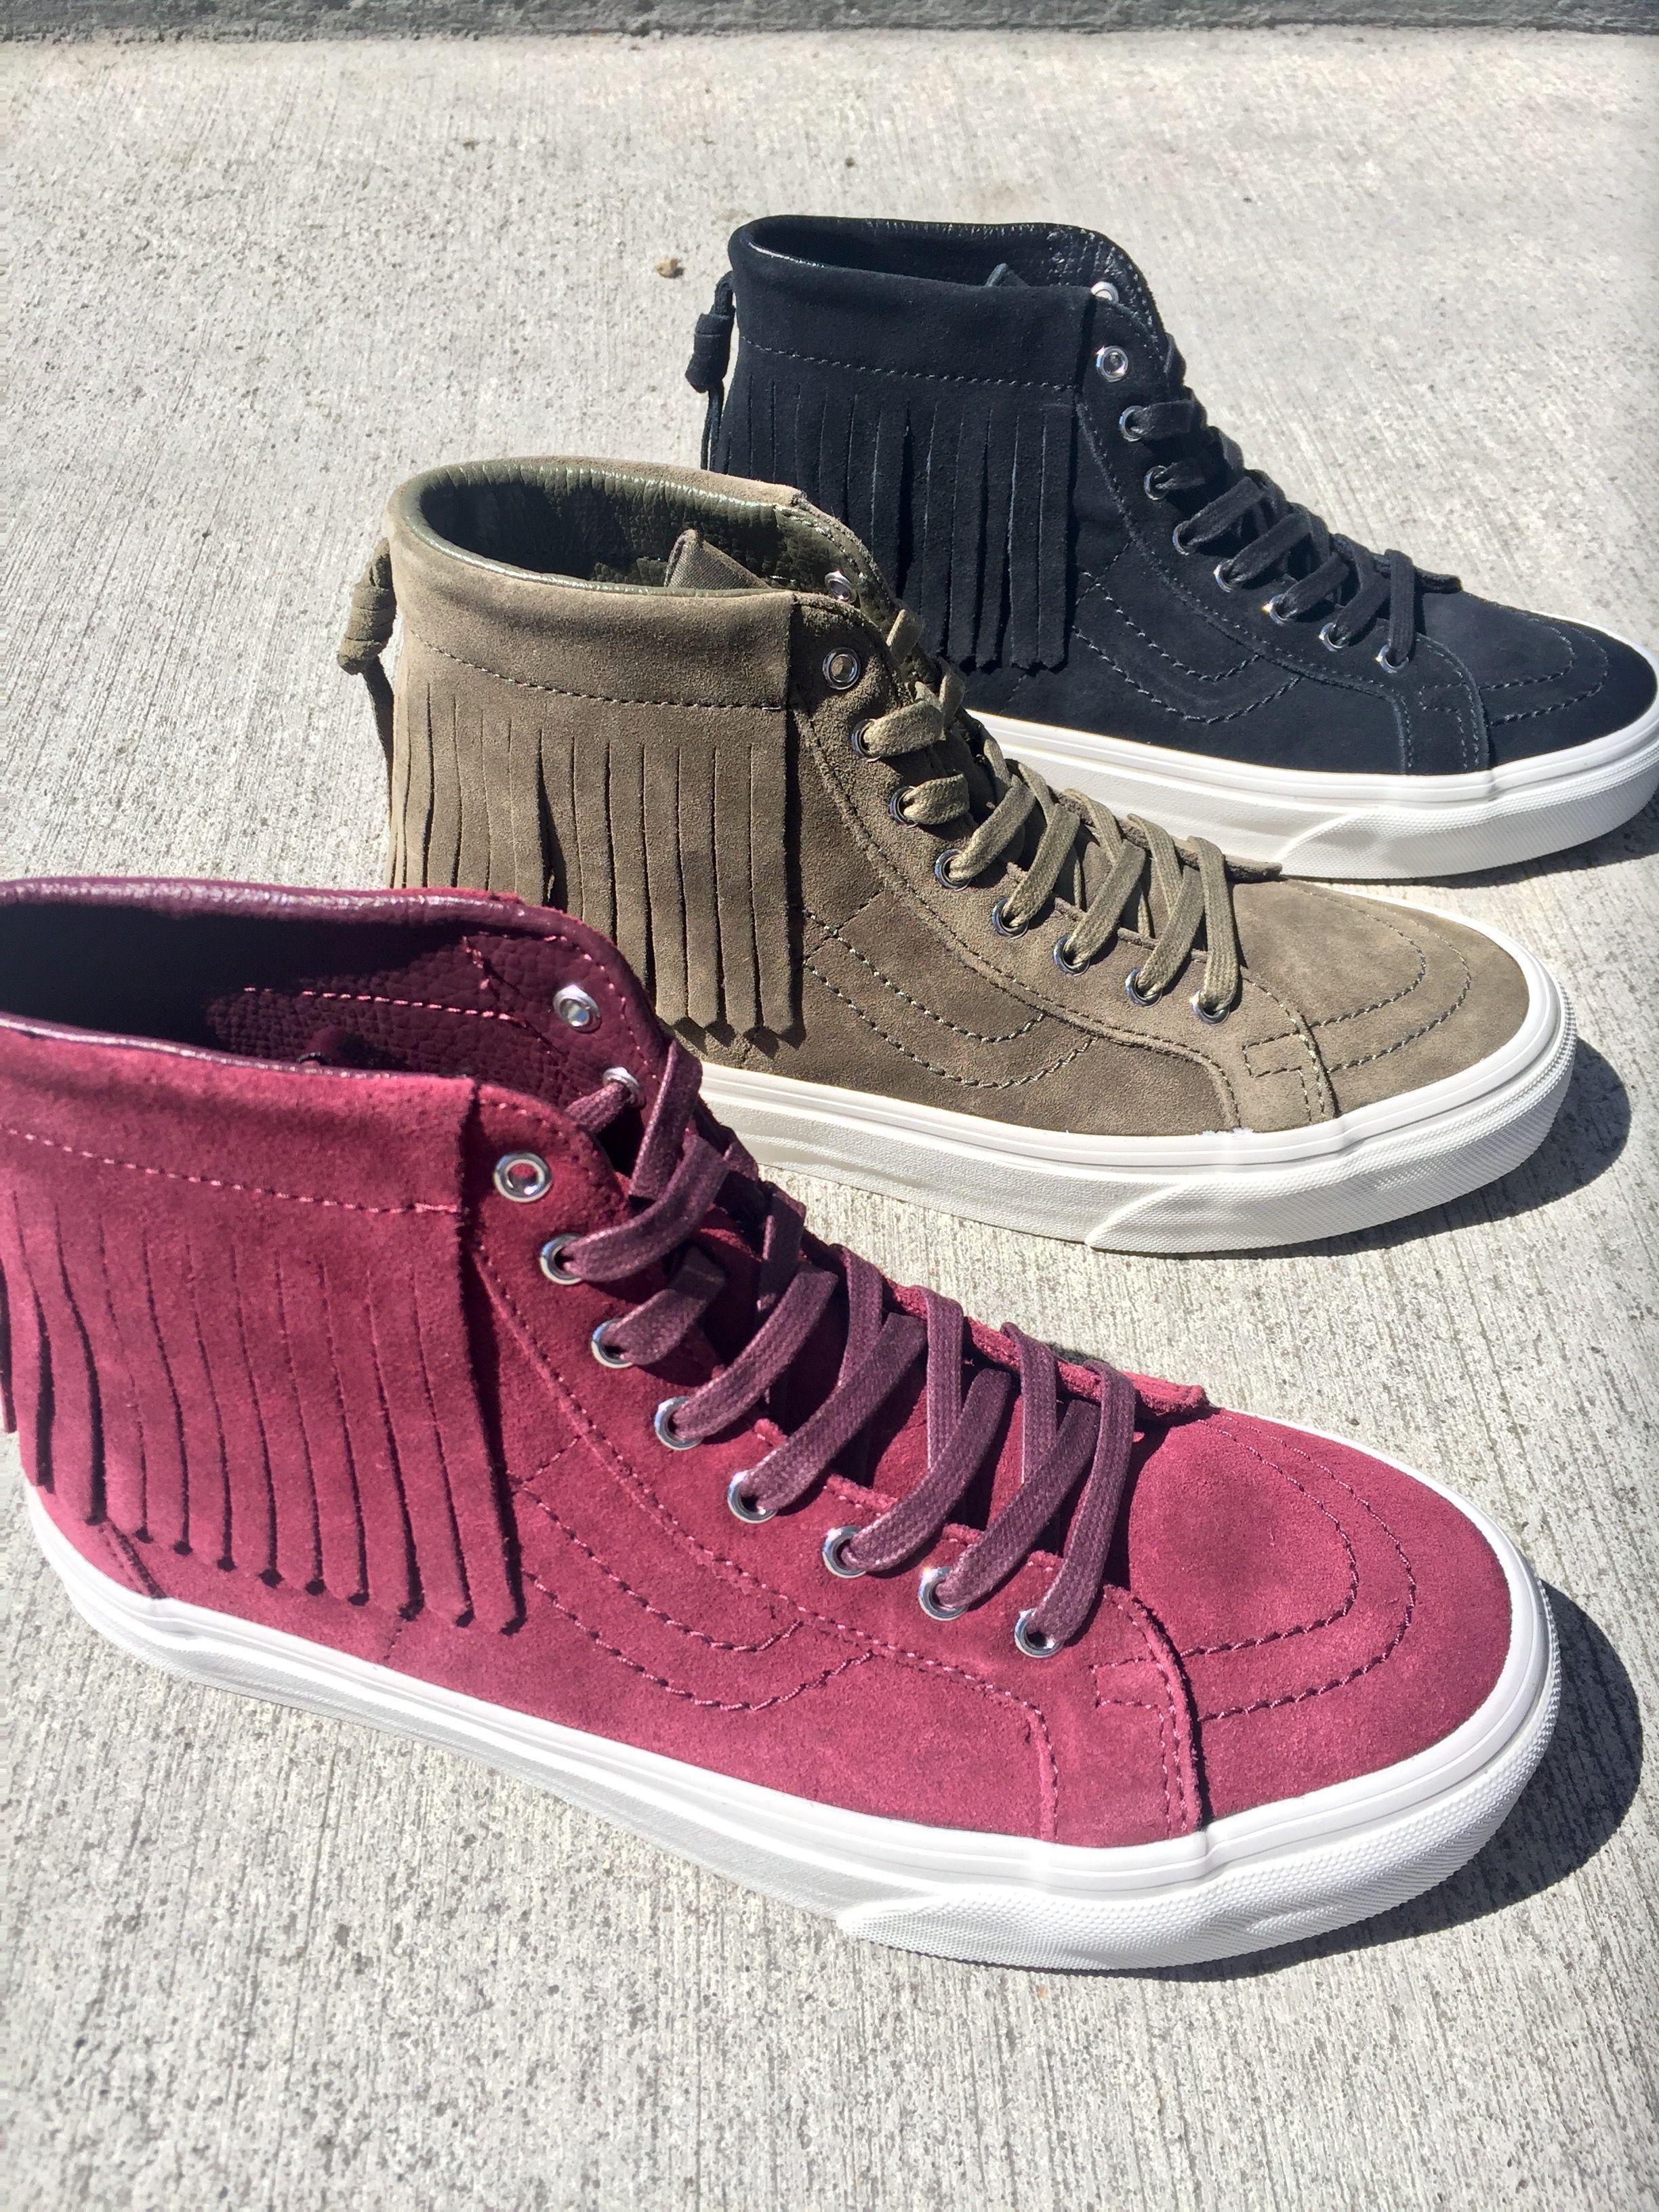 Vans Sk8-Hi Port Royale Moc Shoes (Women s) 558bf40bc0f